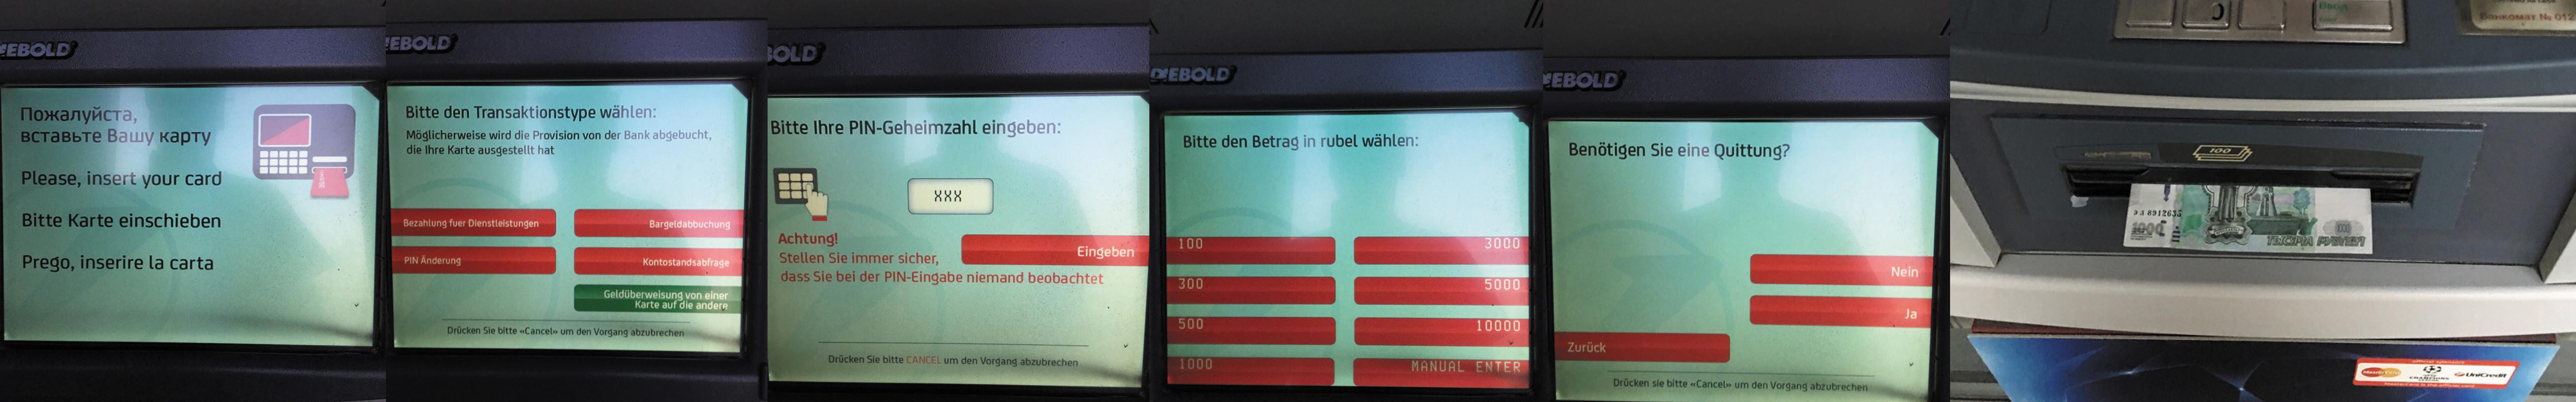 geld-abheben-russland-geldautomat